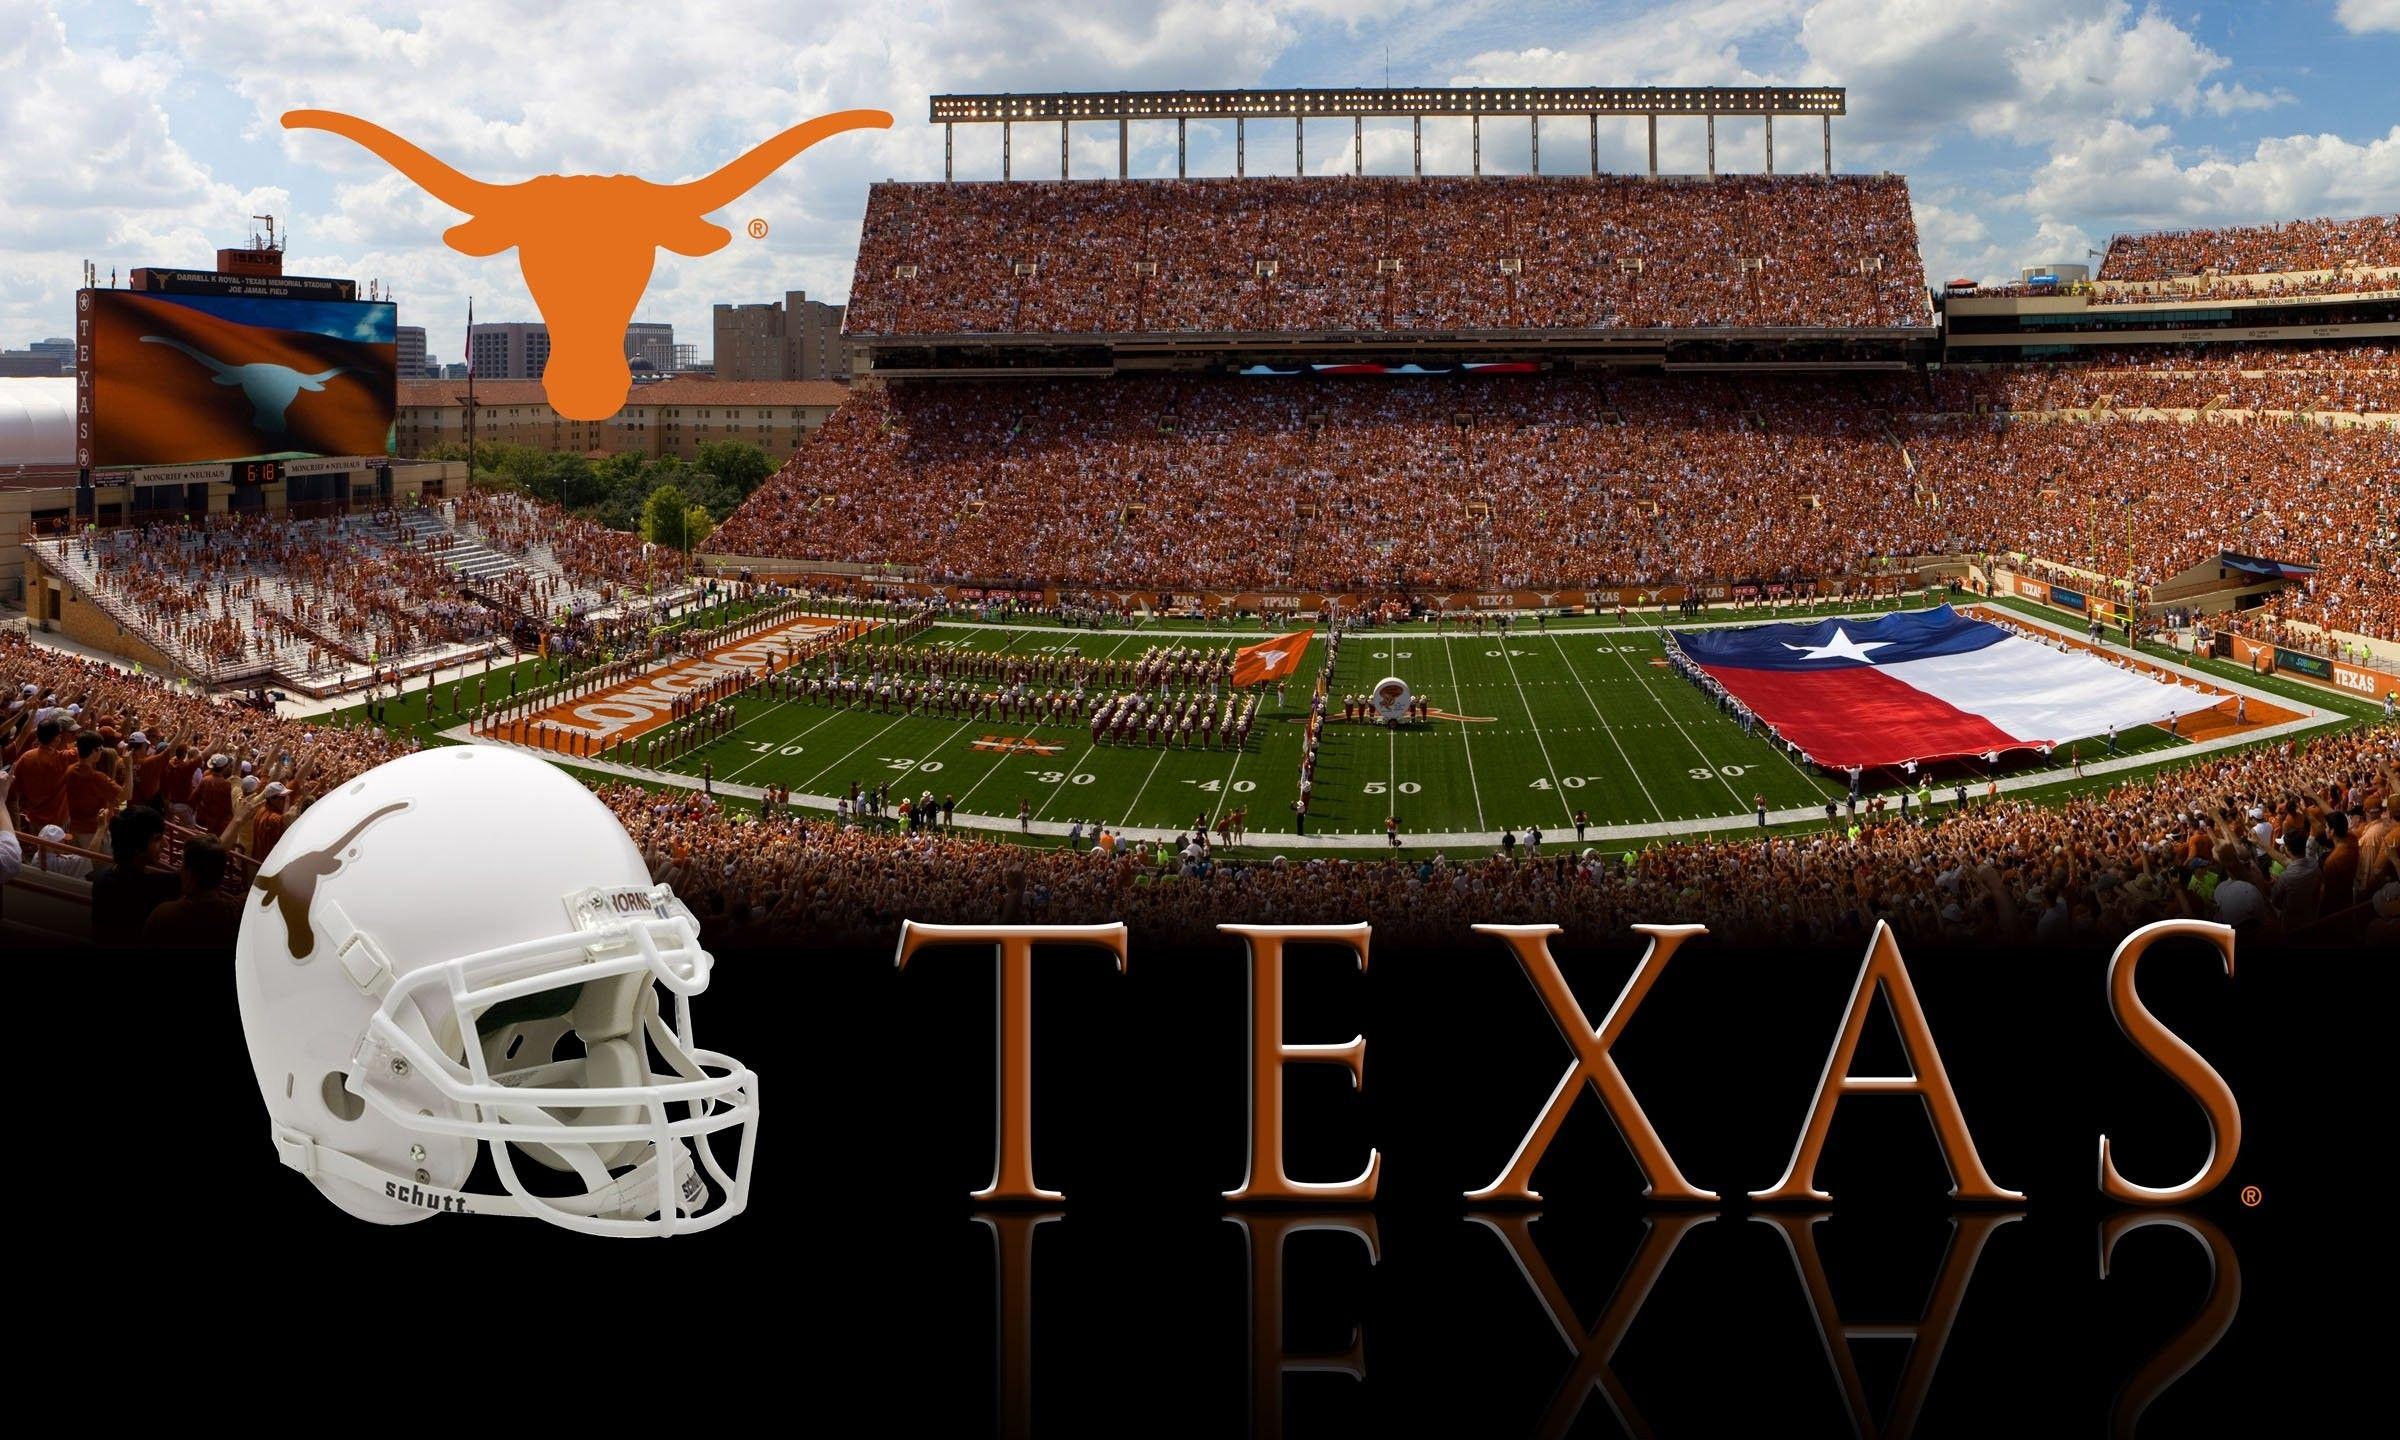 Texas Longhorns Football Wallpapers Wallpapers 2020 Texas Longhorns Football Longhorns Football Football Wallpaper